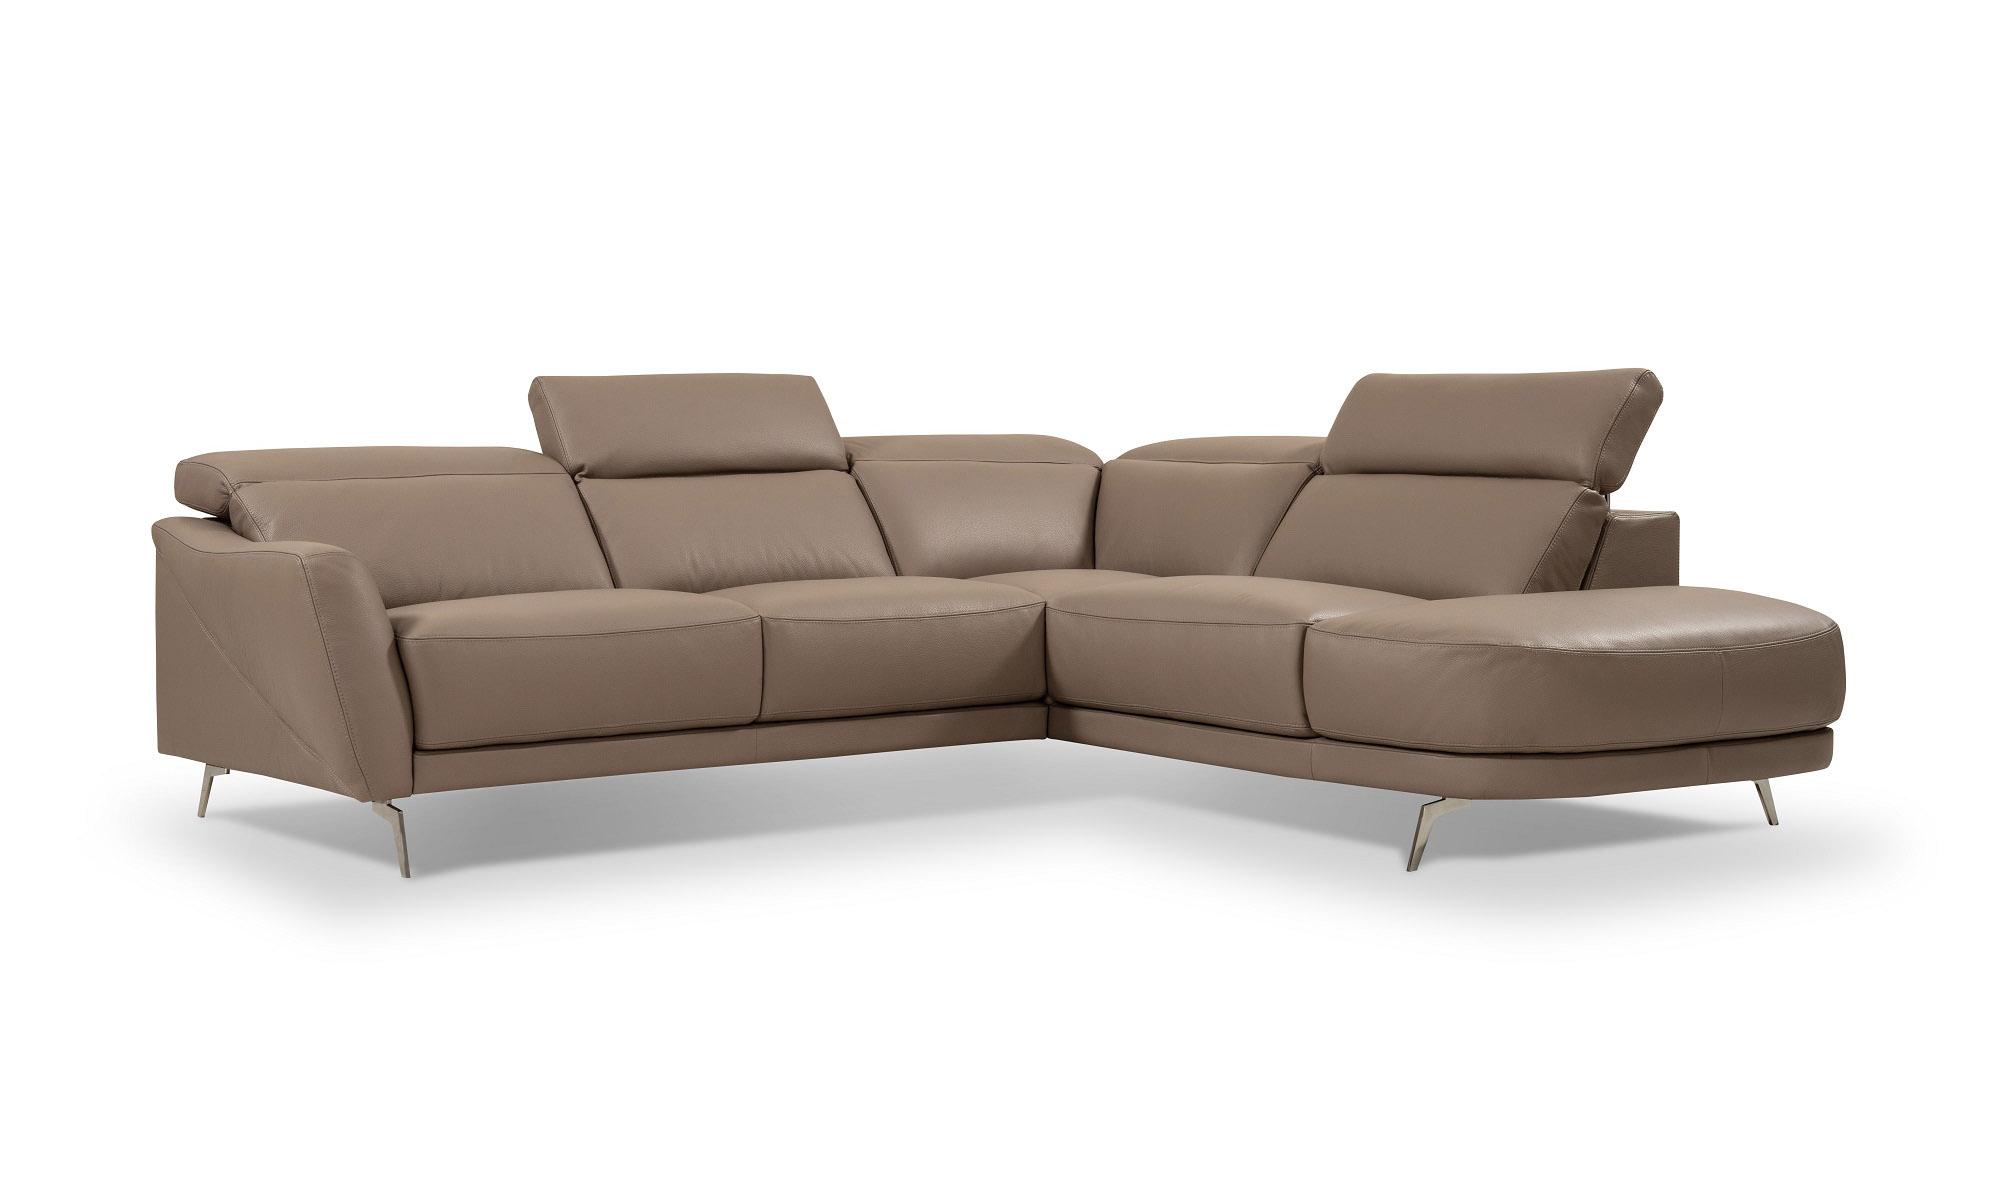 High-class Leather Upholstery Corner L-shape Sofa